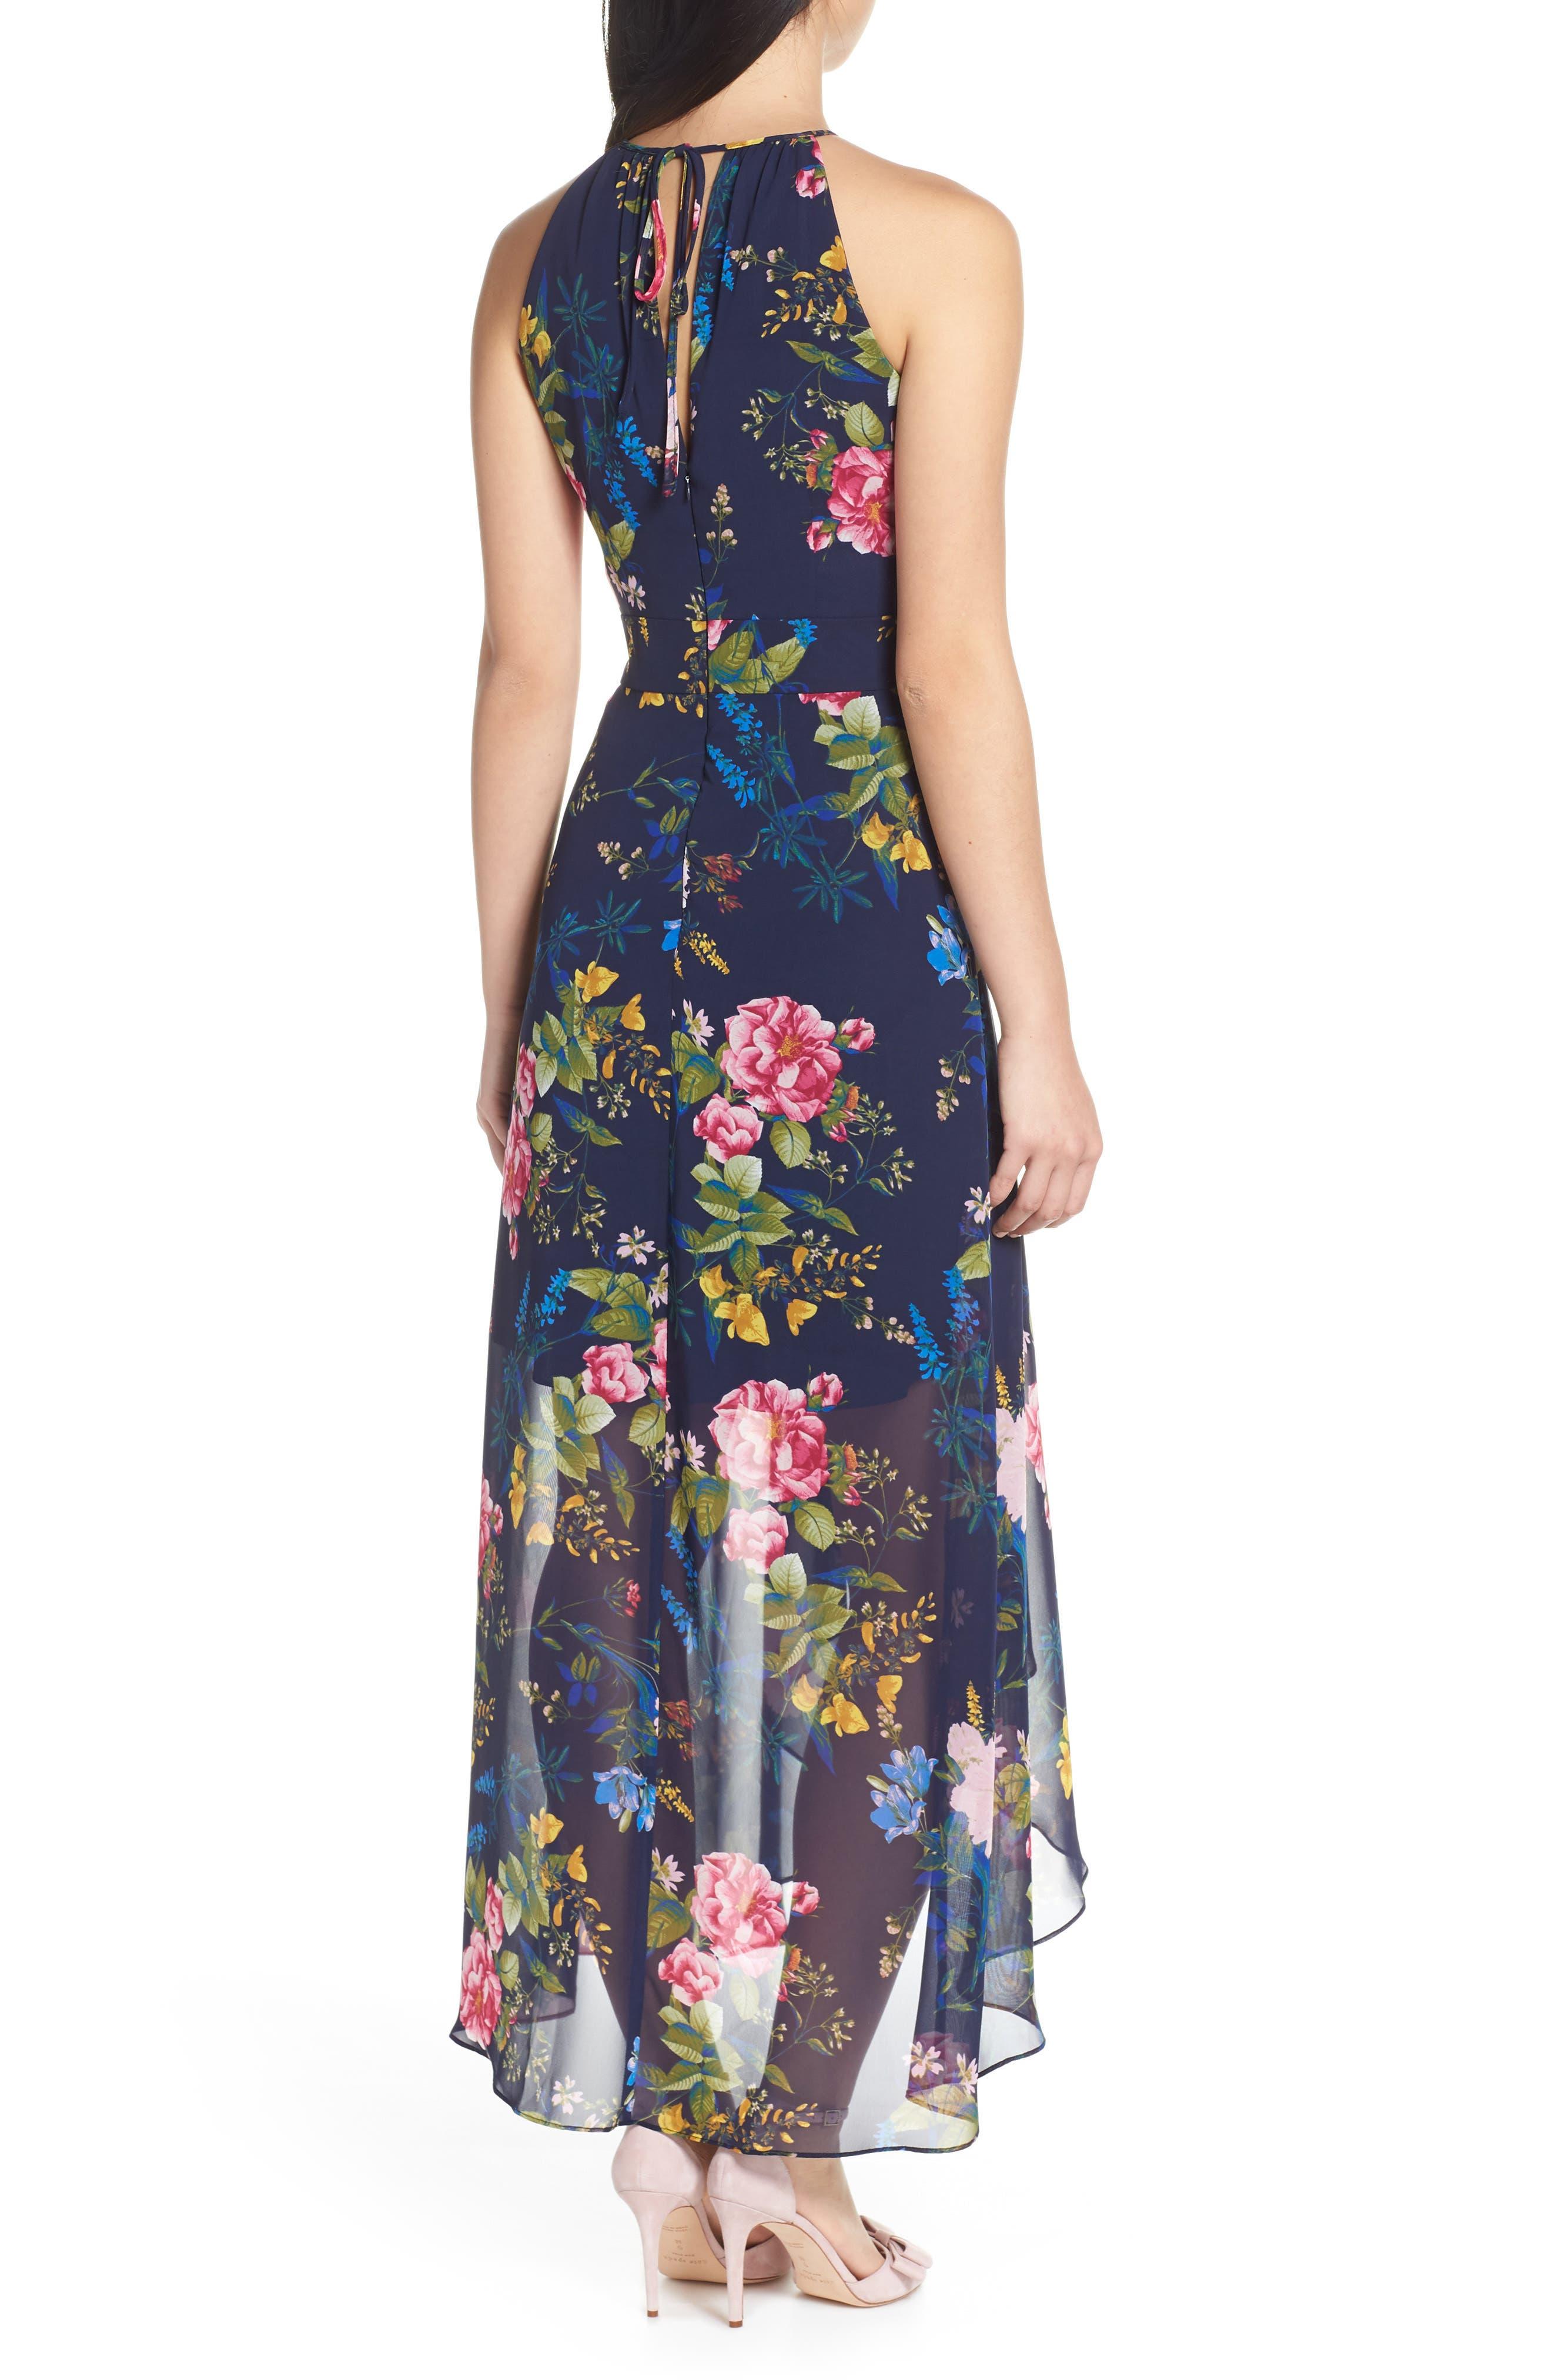 ELIZA J, Floral Print Chiffon Halter Dress, Alternate thumbnail 2, color, NAVY